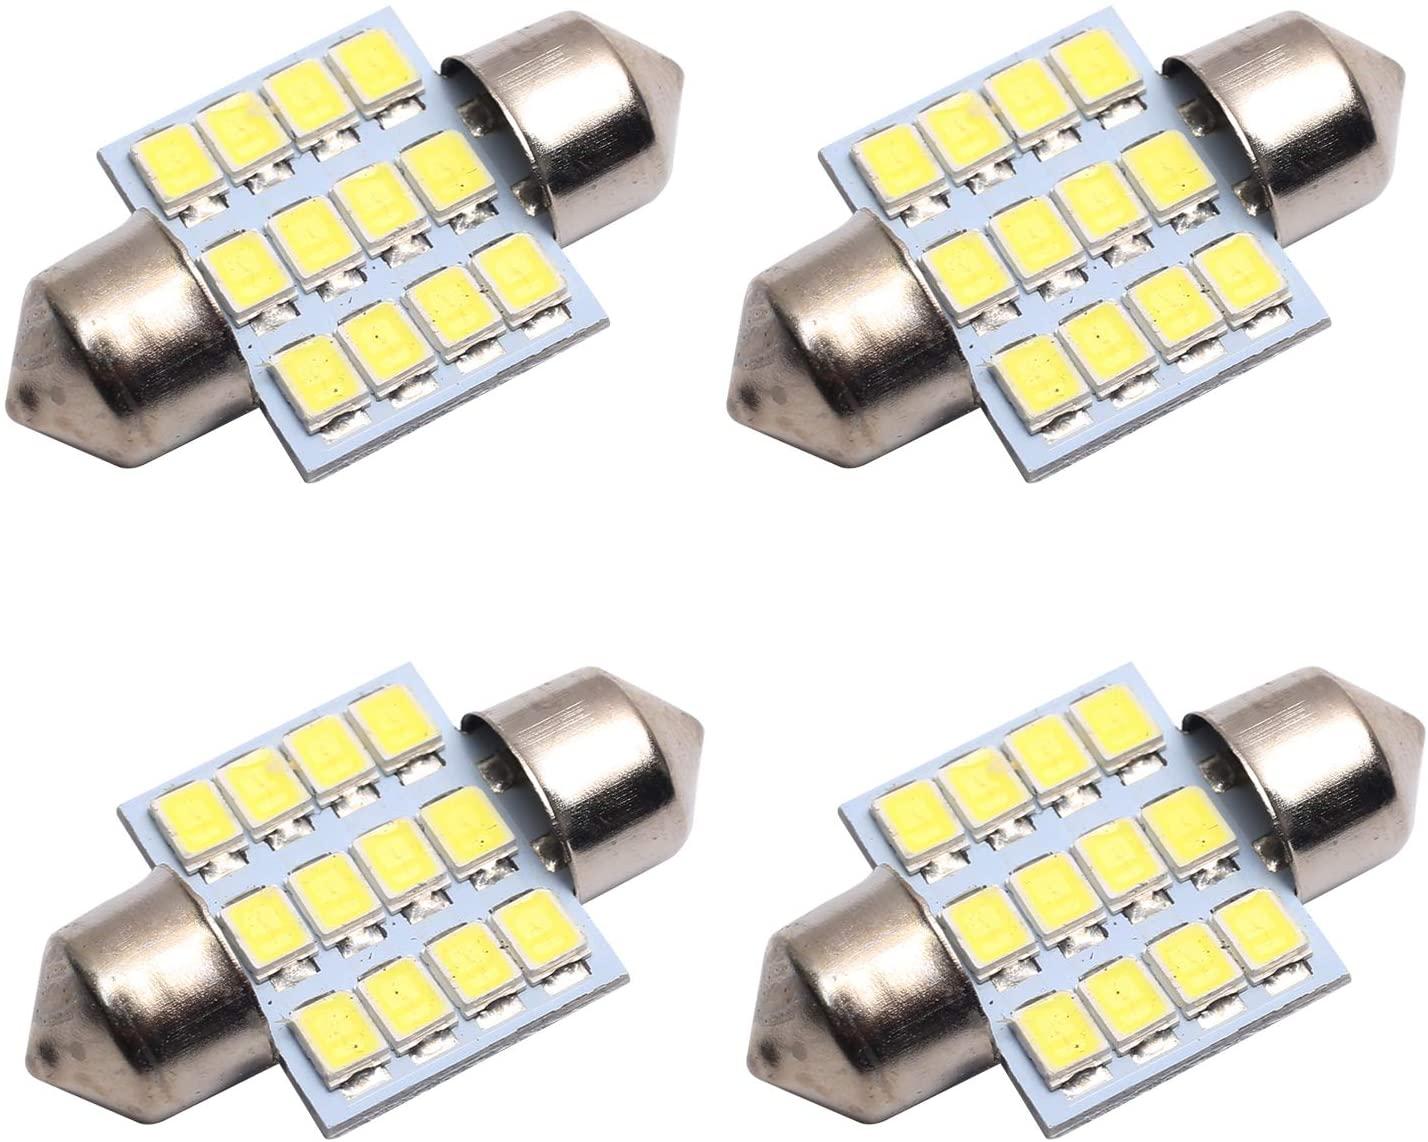 4PCS 3175 LED Bulbs by CENTAURUS, Super Bright 7000K Cool White DE3175 DE3022 3022 31mm 1.22 12SMD Festoon LED Dome License lights Bulbs for Dome,Map,Door,Trunk cargo light etc